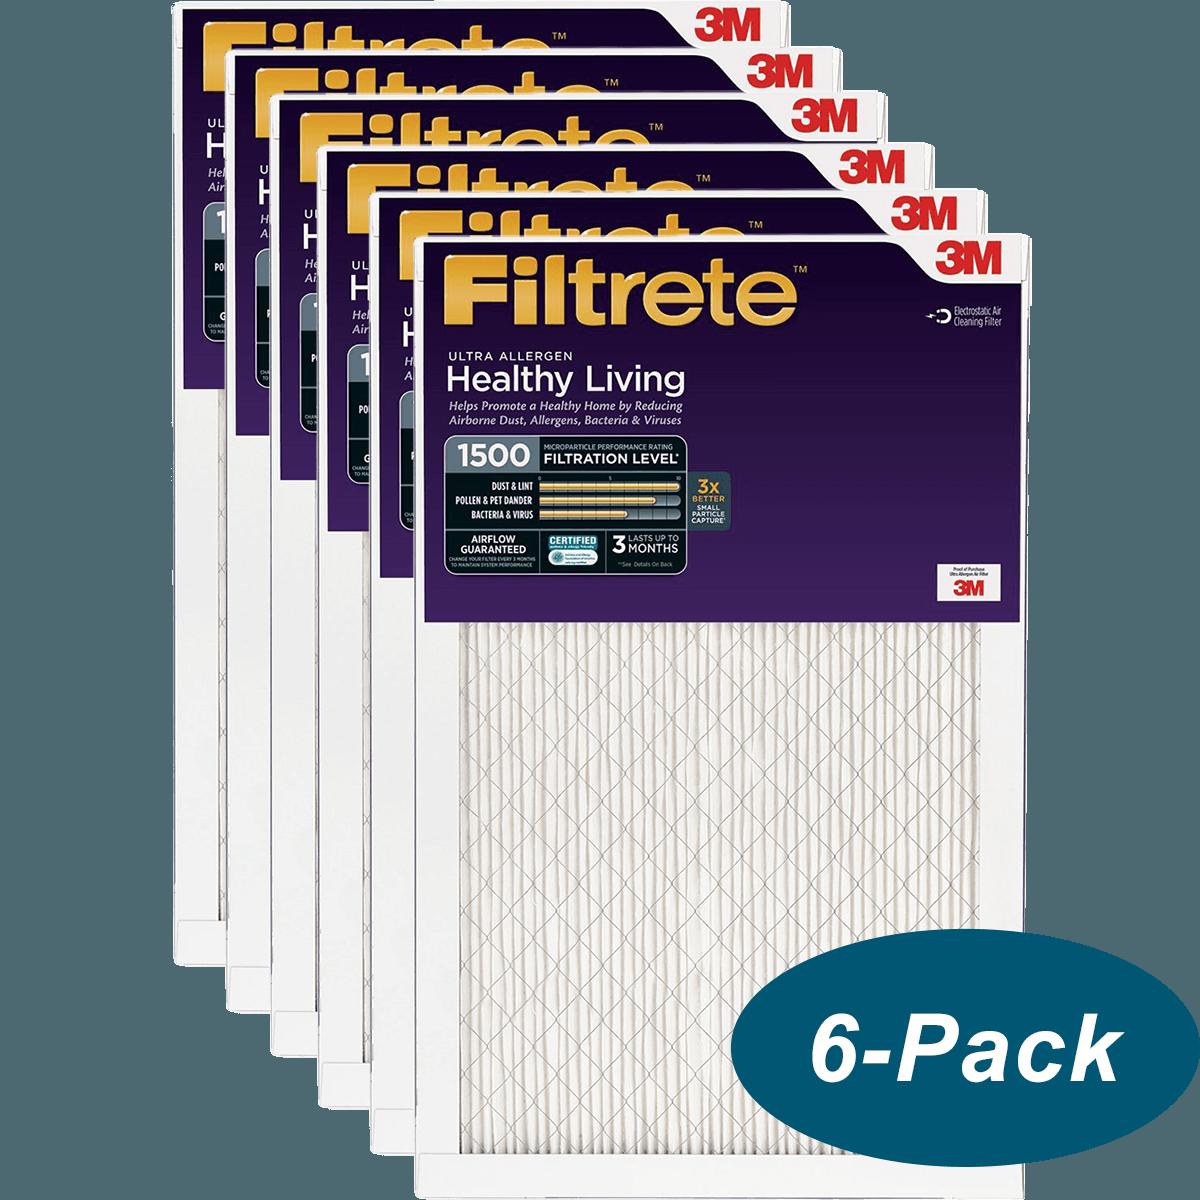 Buy Cheap Filtrete Healthy Living 1500 MPR Ultra Allergen